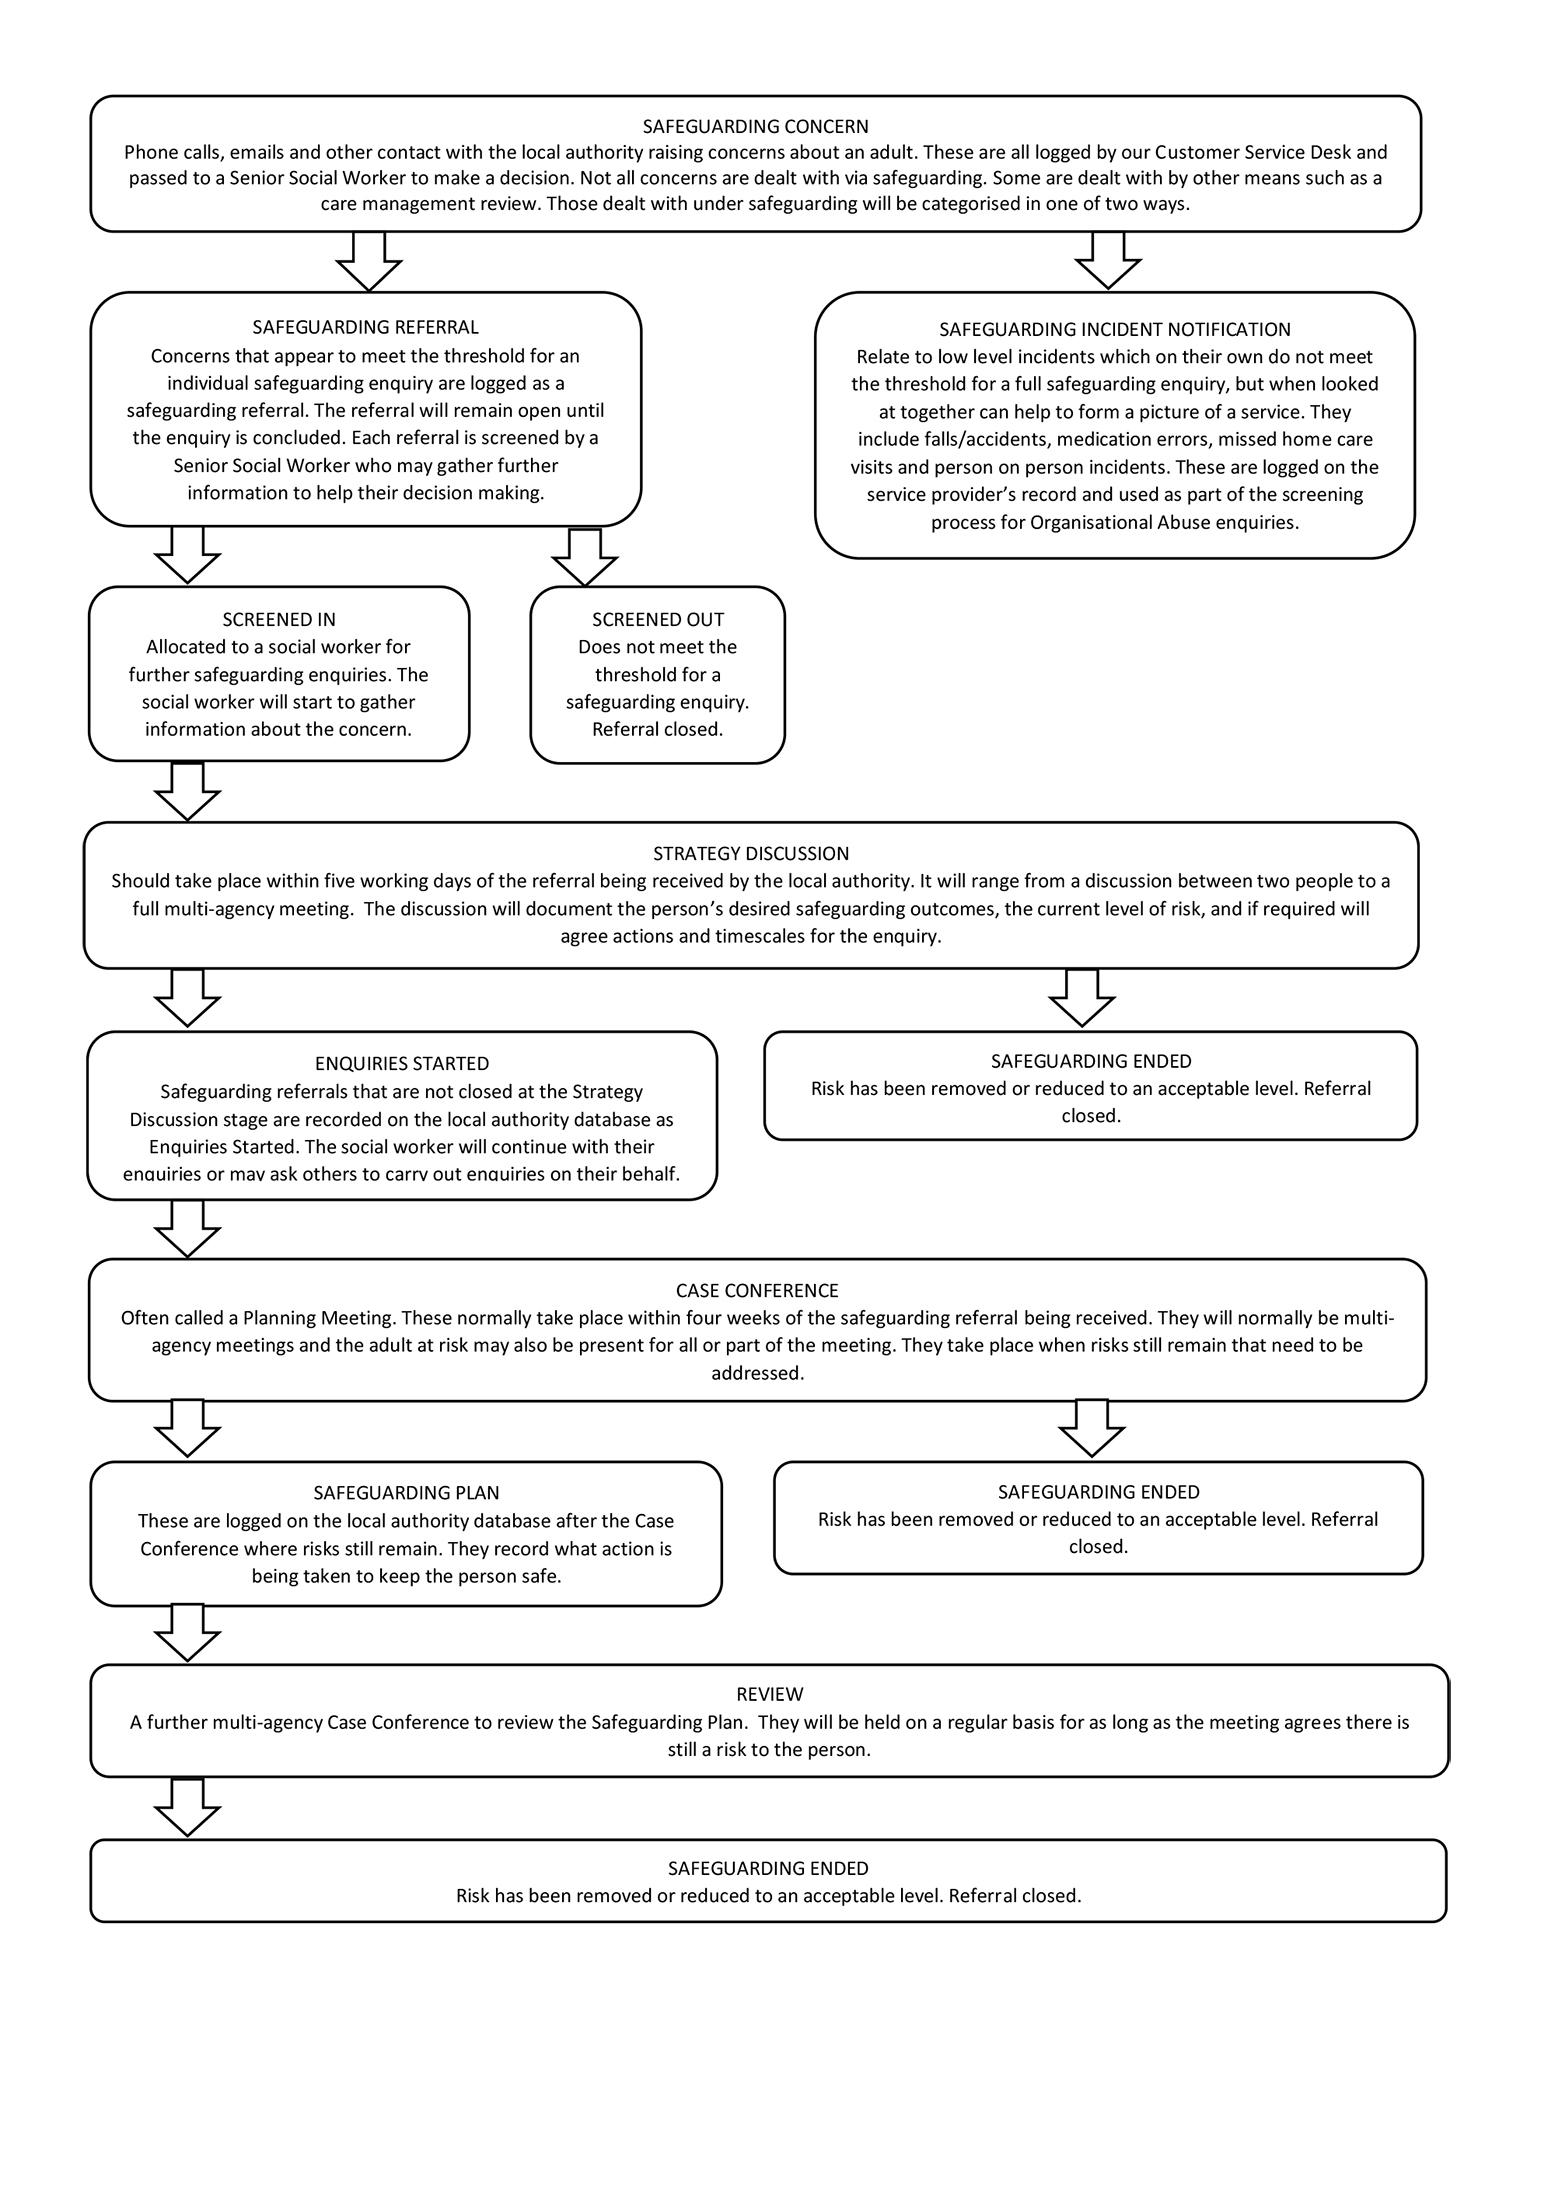 Safeguarding Process Flowchart